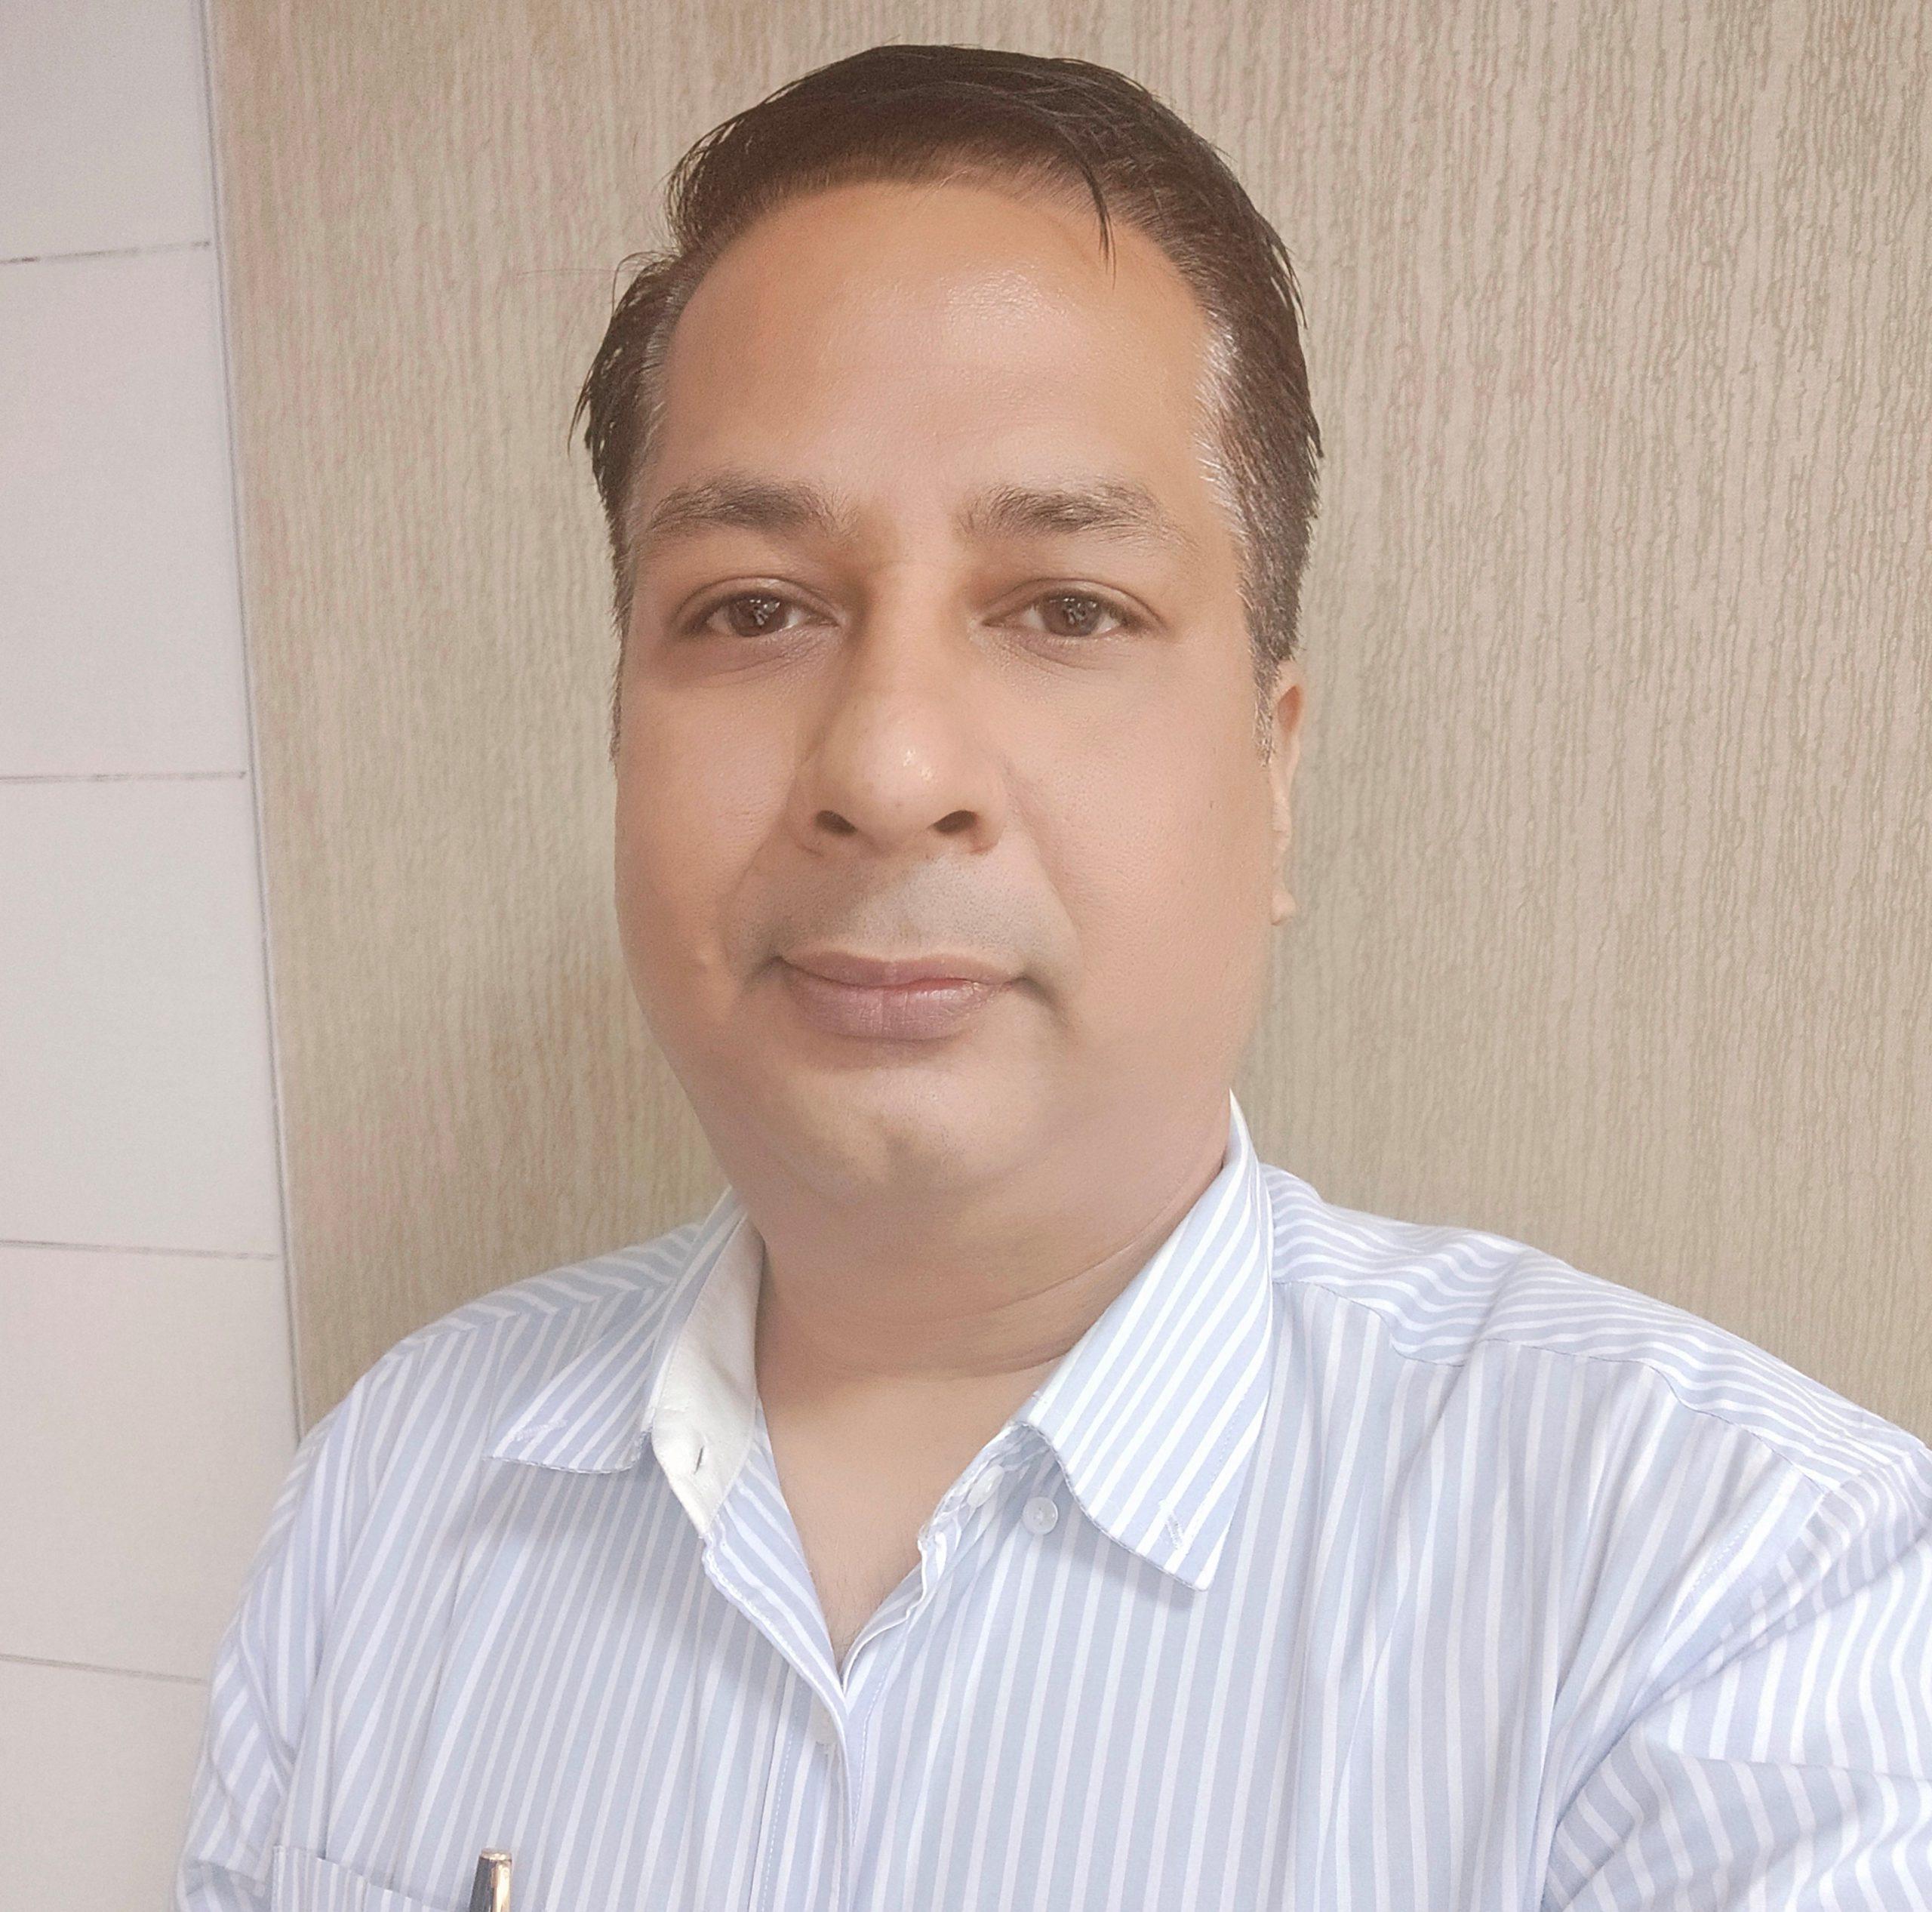 Raj Gangwani